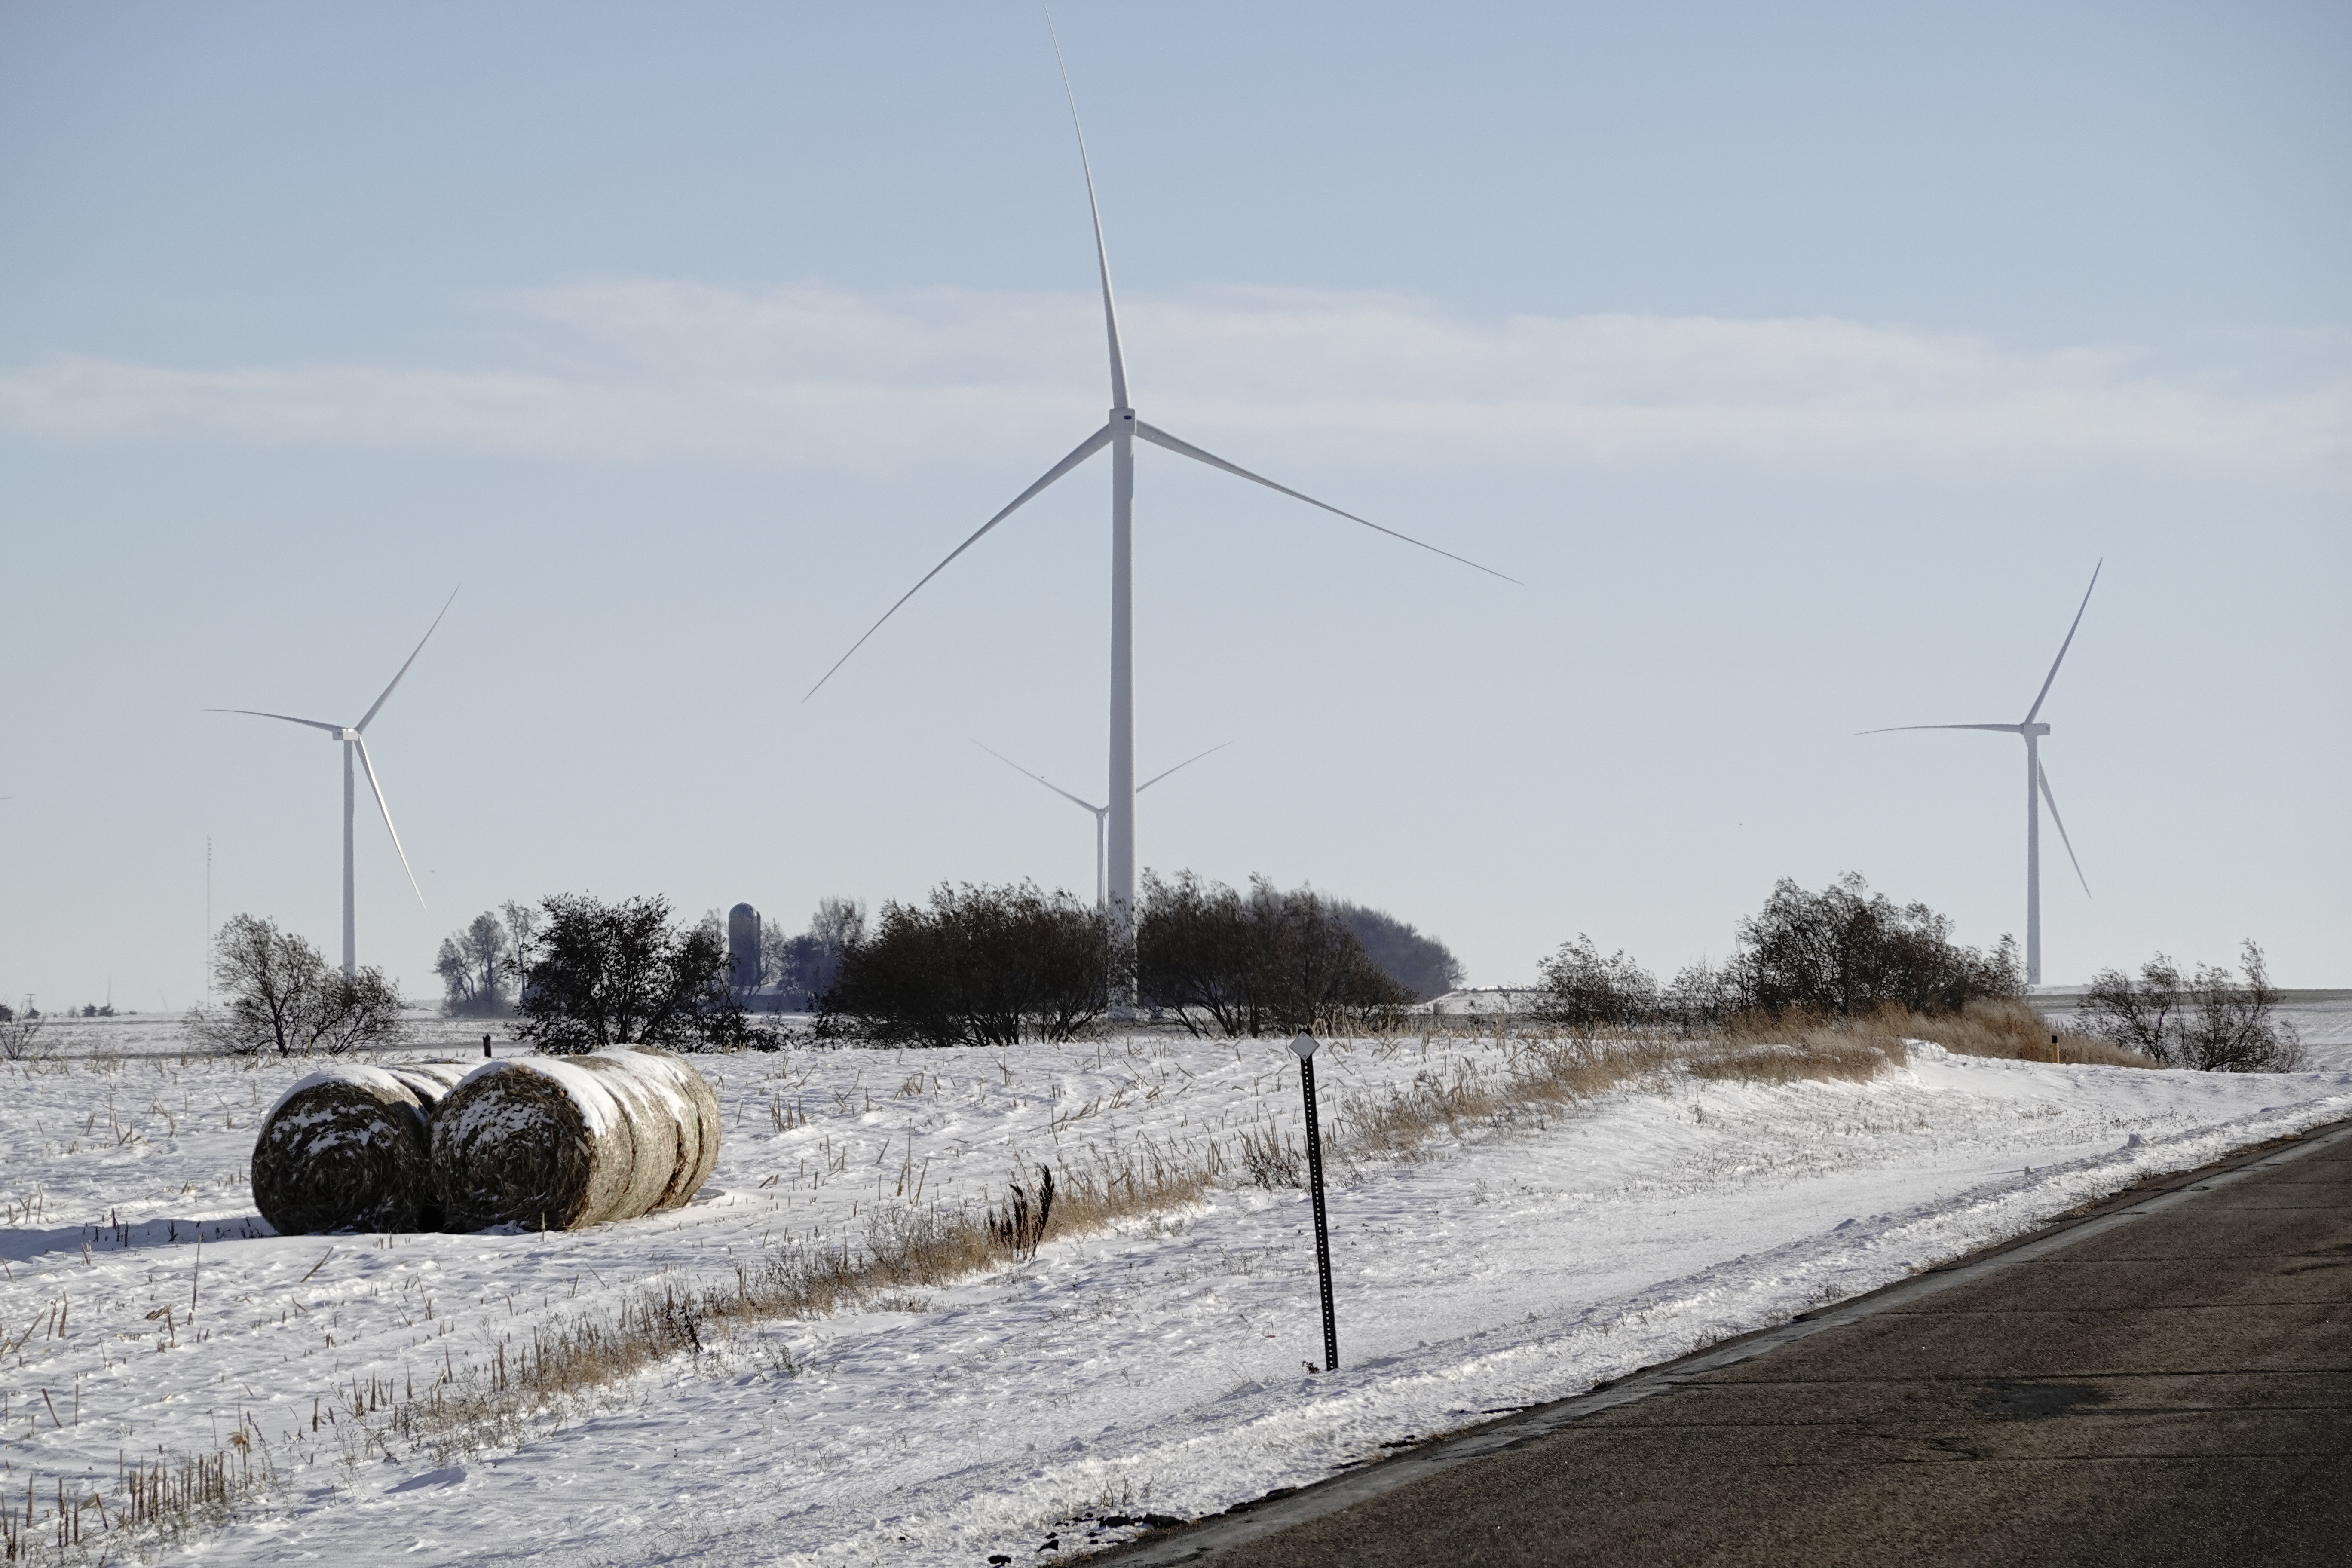 Acciona Windpower 1.5 MW wind turbine generators are seen on Tatanka Wind Farm as the coronavirus disease (COVID-19) outbreak continues in Brandt, South Dakota, U.S., October 27, 2020. REUTERS/Bing Guan - RC2DRJ9H7AMM